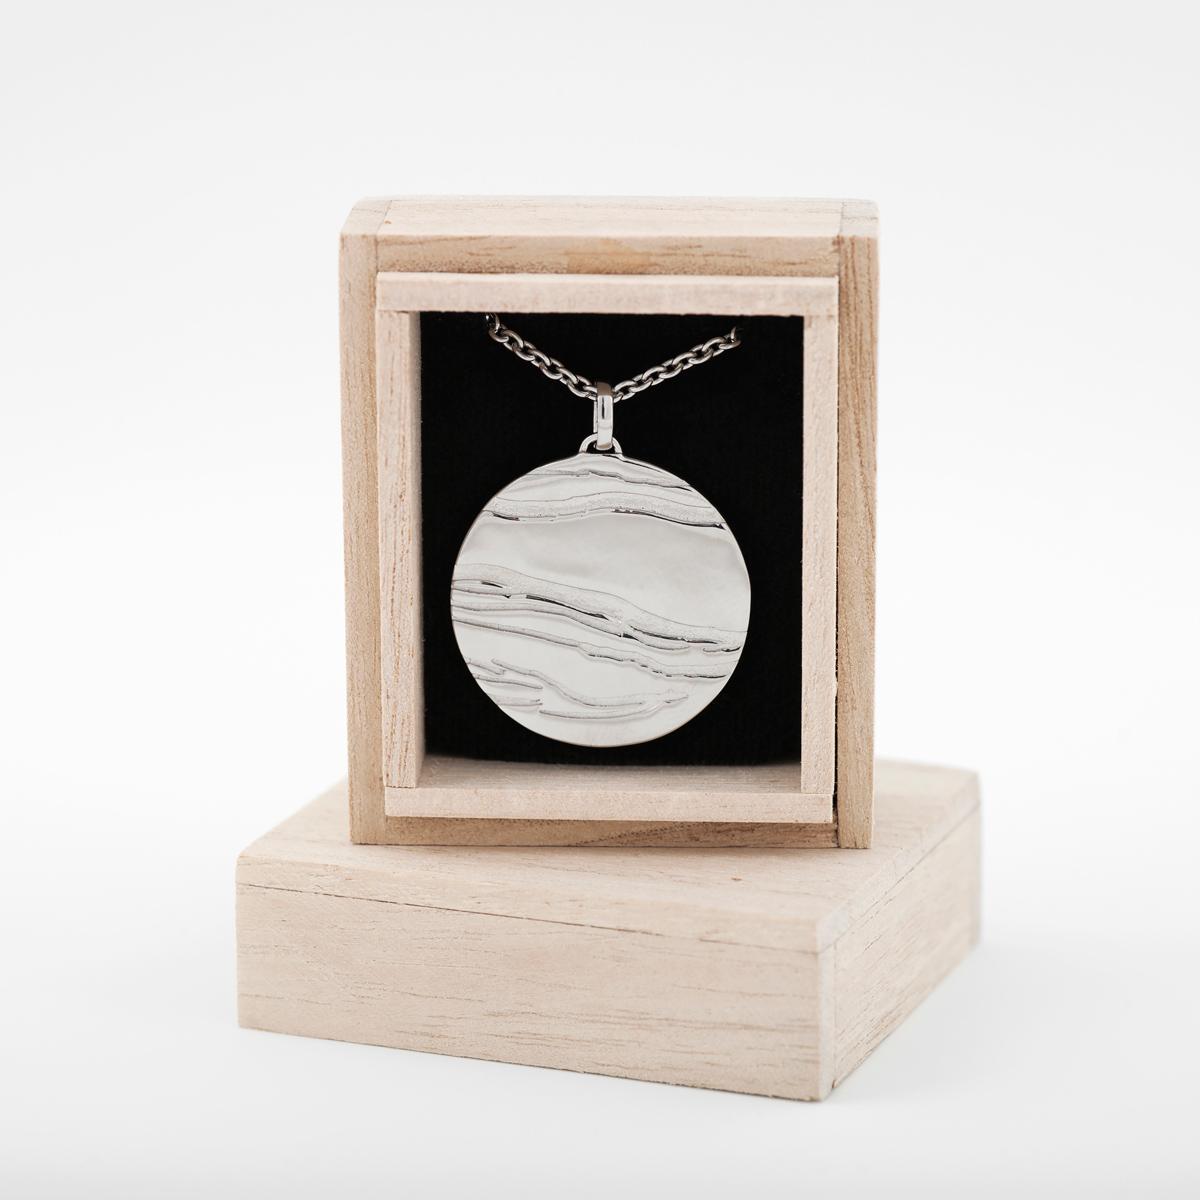 The Scream silver necklace